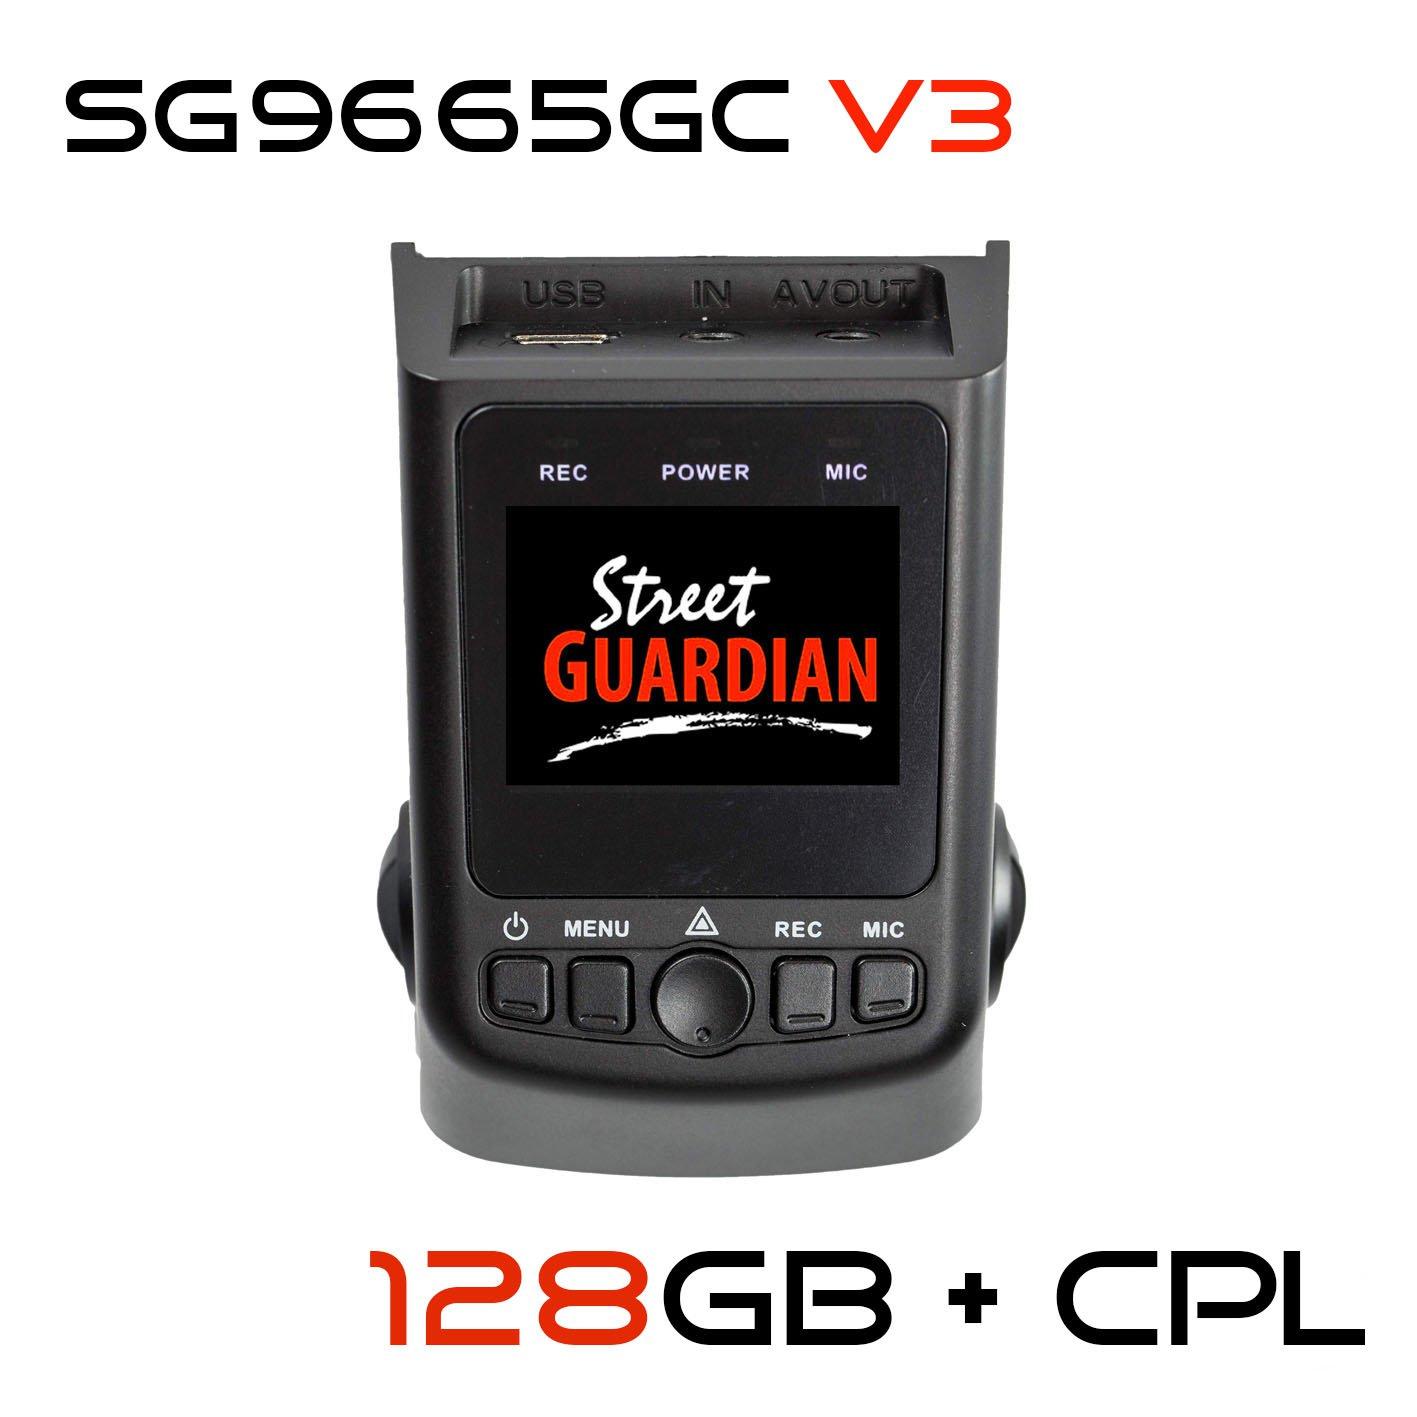 SG9665GC V3 128GB + CPL